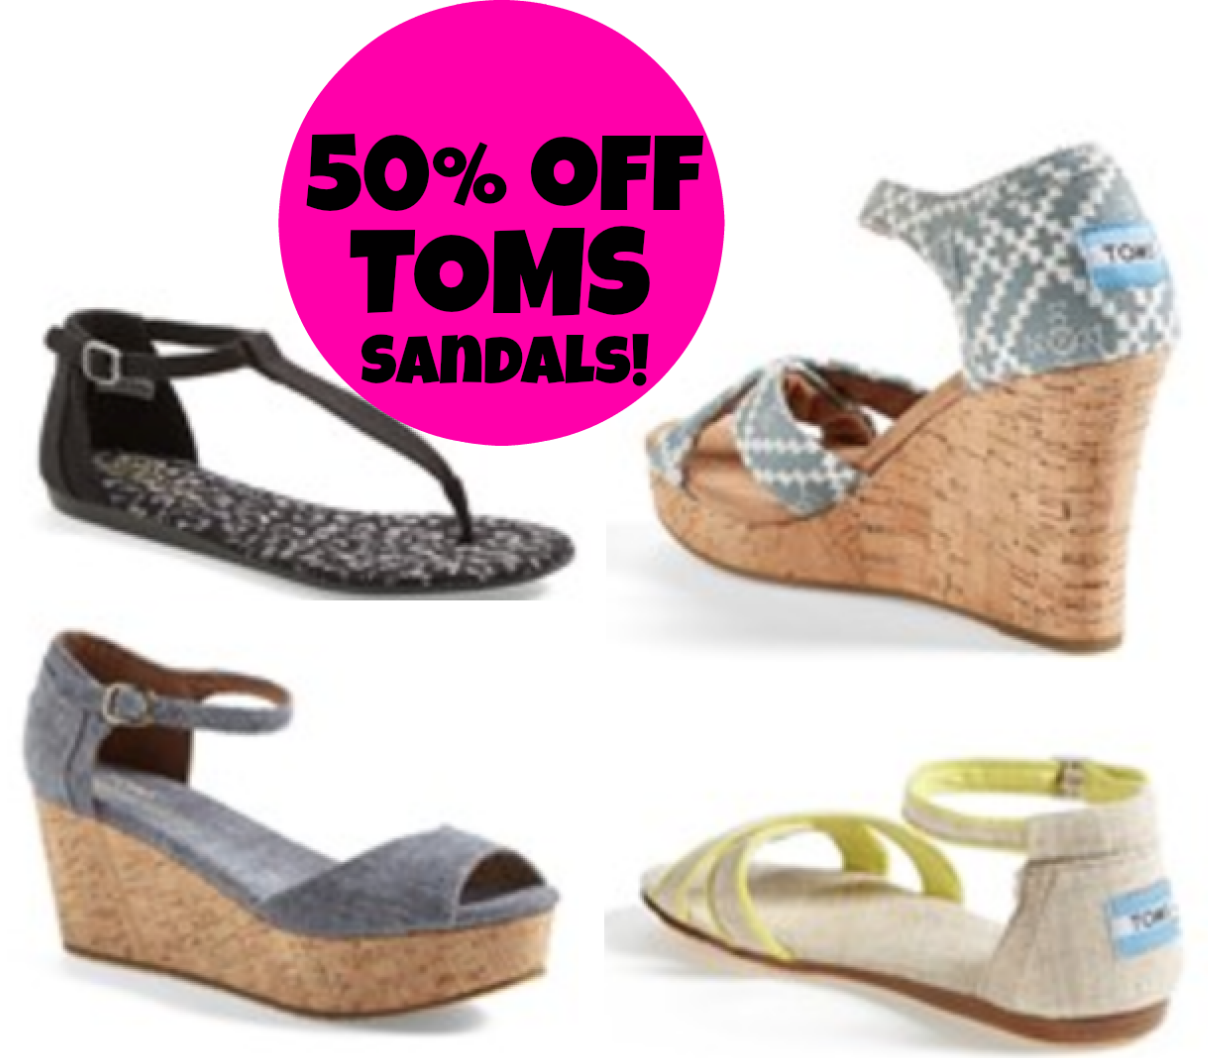 http://www.thebinderladies.com/2014/09/nordstromcom-50-off-toms-sandals-free.html#.VA48Z0vdtbw